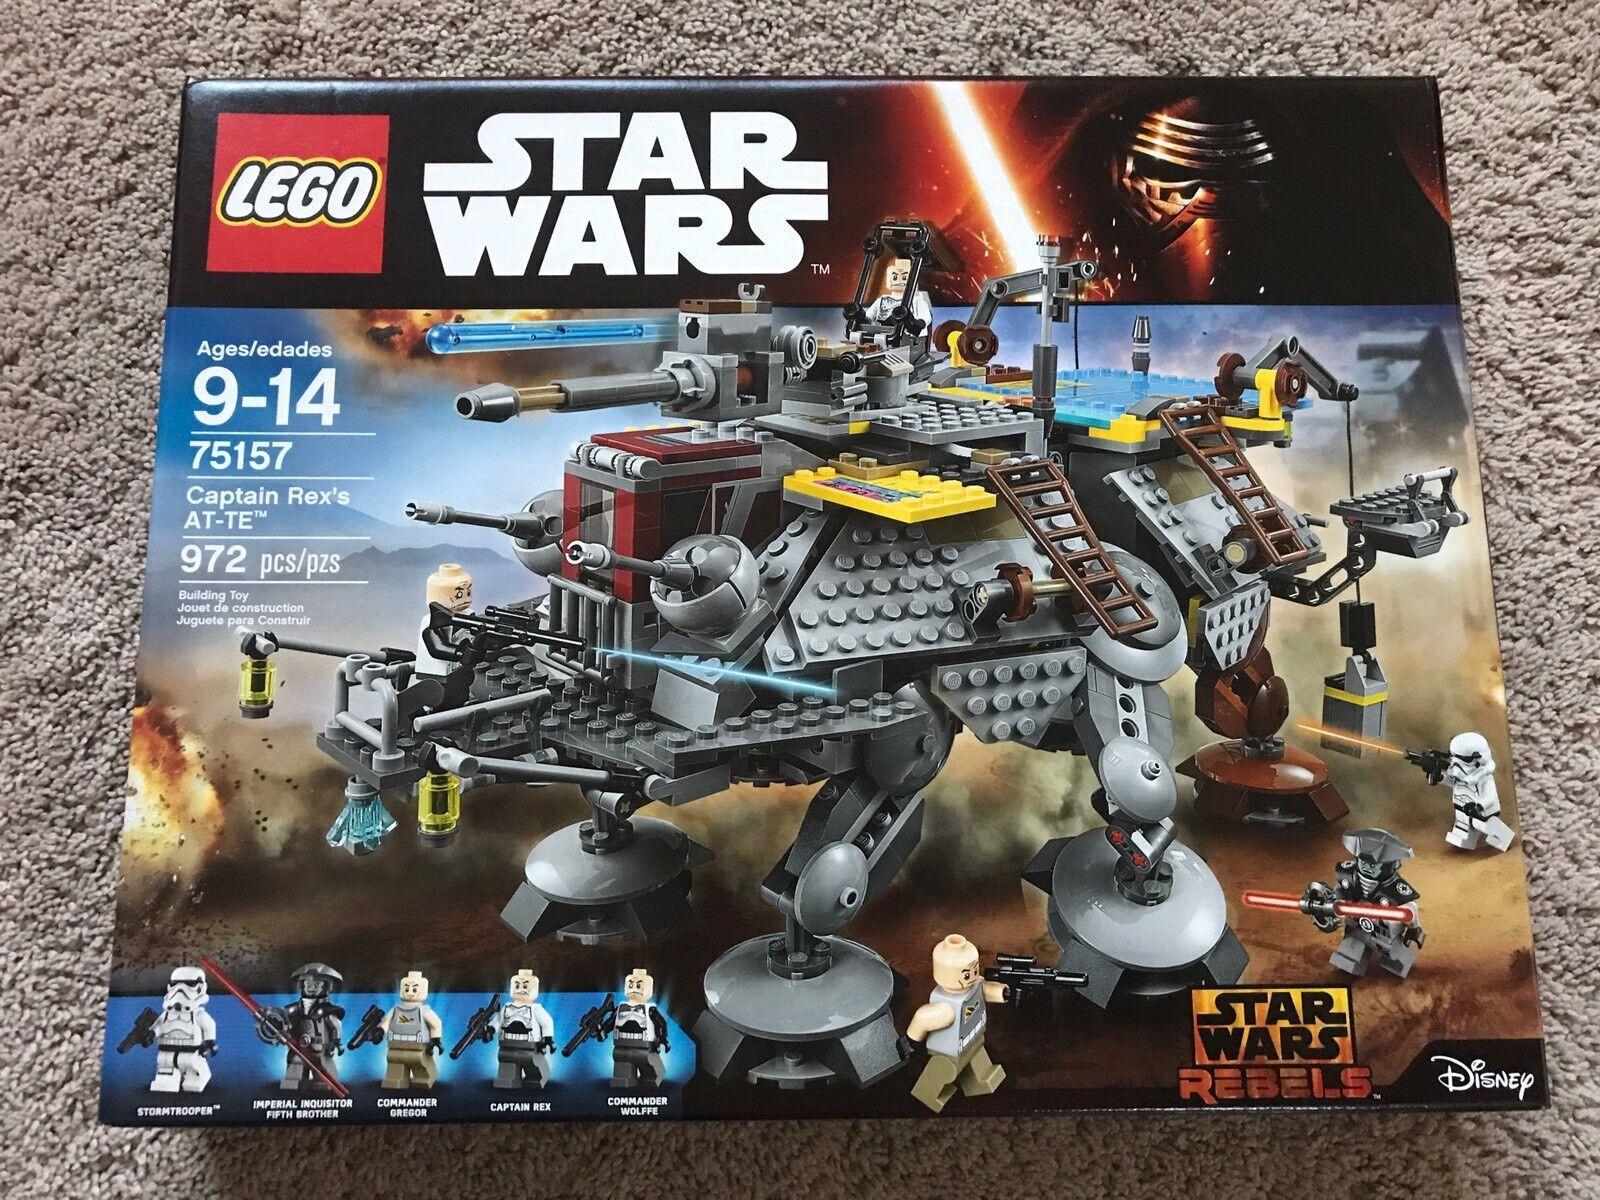 nuovo, SEALED  LEGO estrella guerras Captain  Rex's at-te - 75157 972 pieces Fast Shipping  ecco l'ultimo